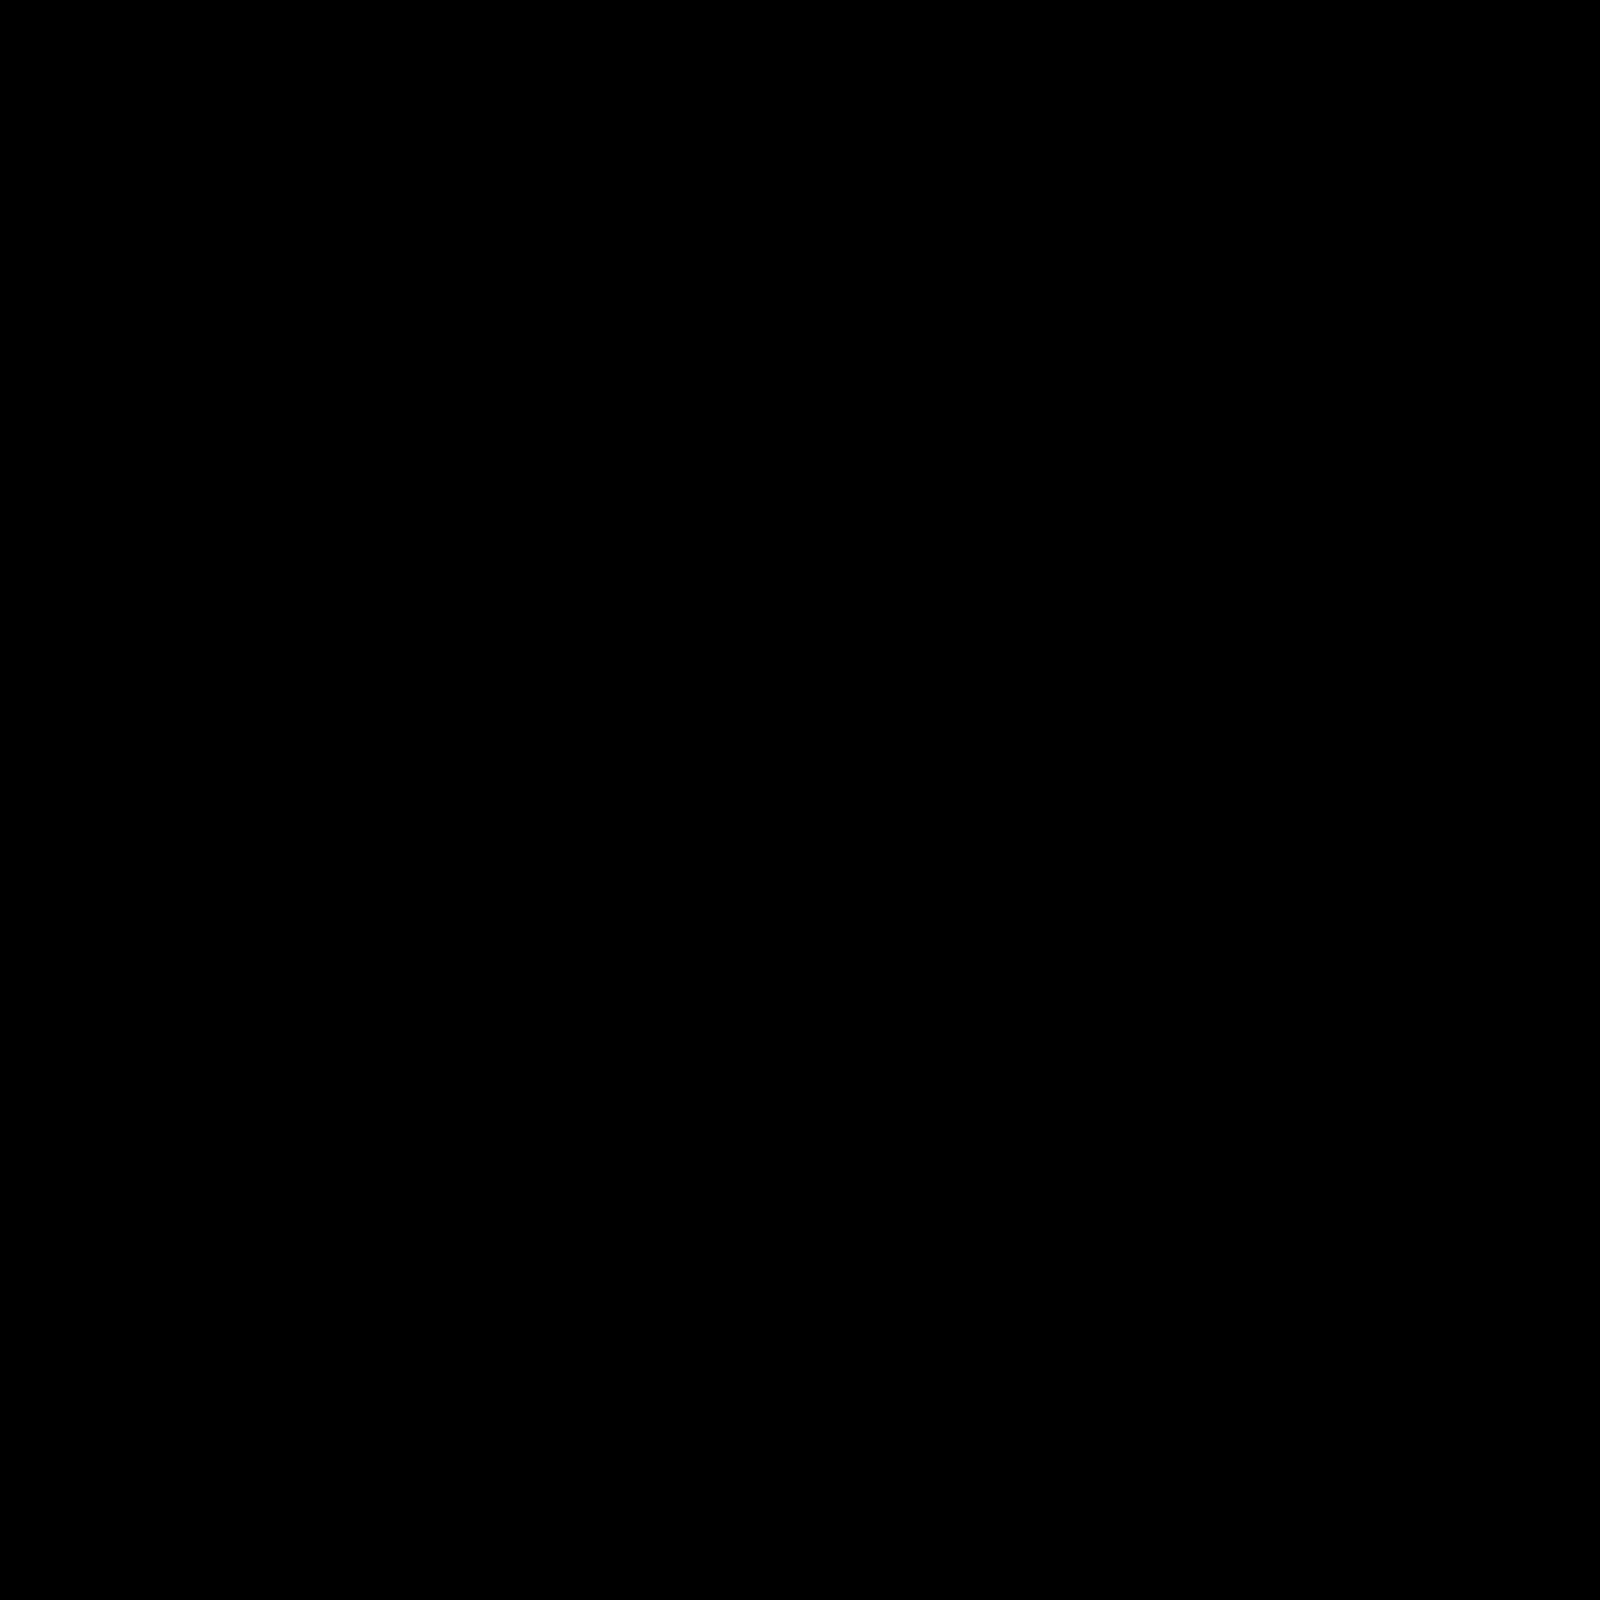 Orçamento icon